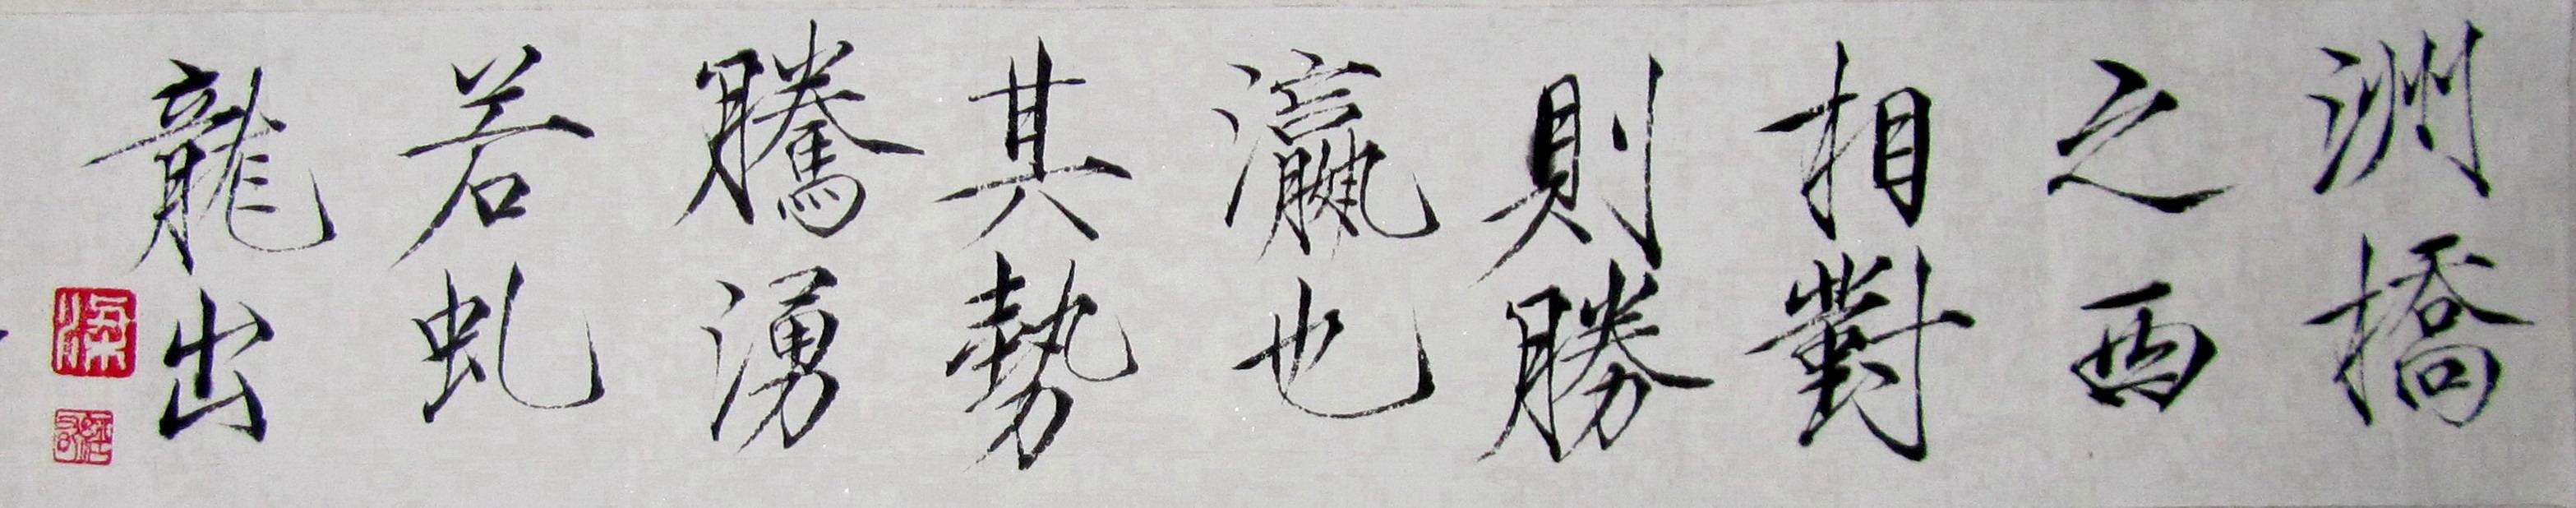 IMG_1823.jpg